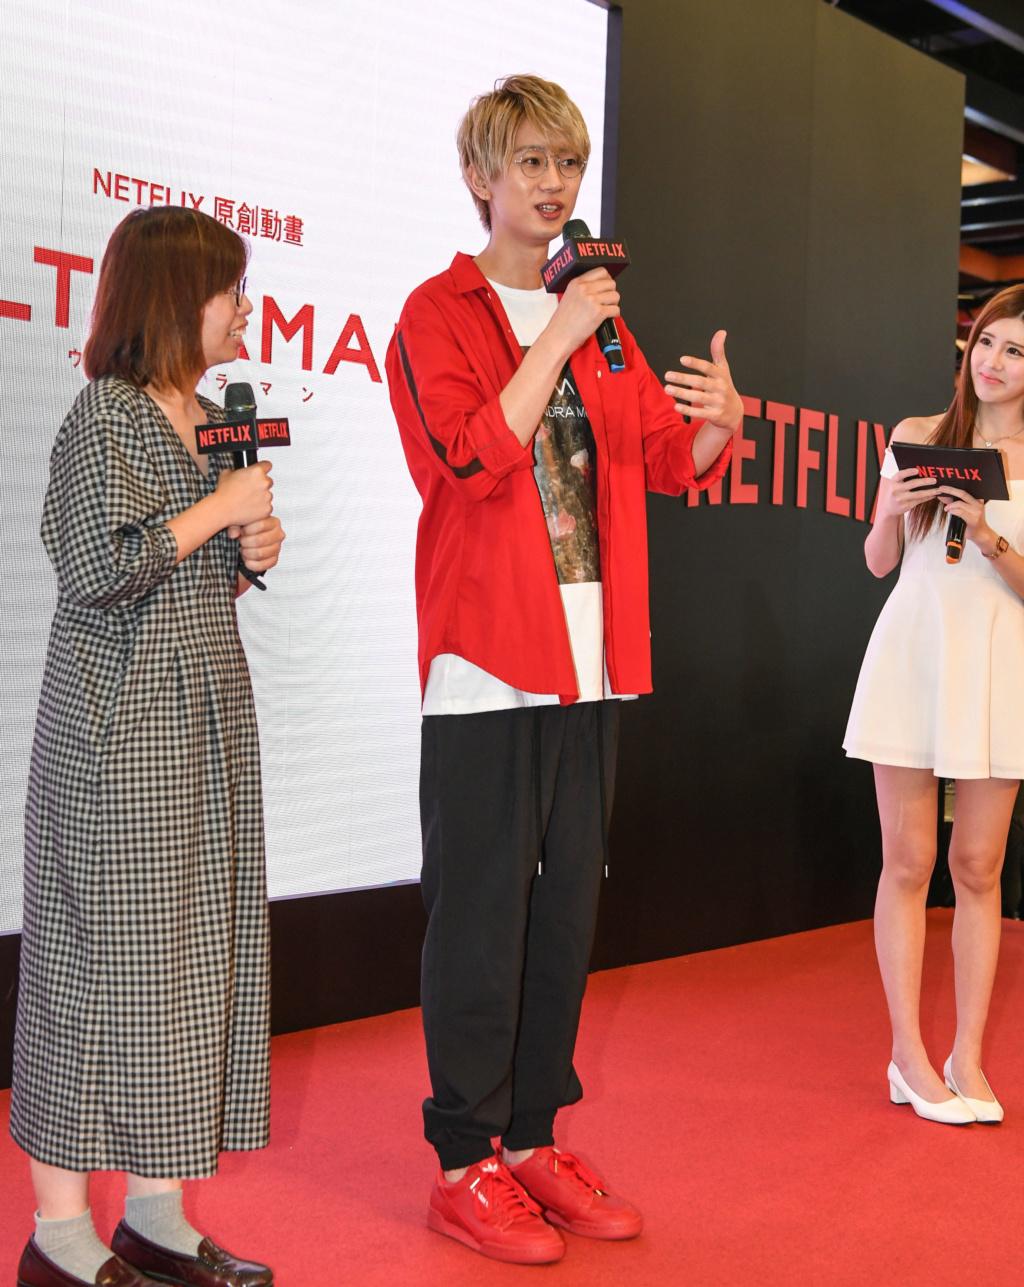 Netflix 台北漫畫博覽會初體驗大成功!星光陣容嗨翻全場粉絲引爆年度盛會最高潮 Taipei25